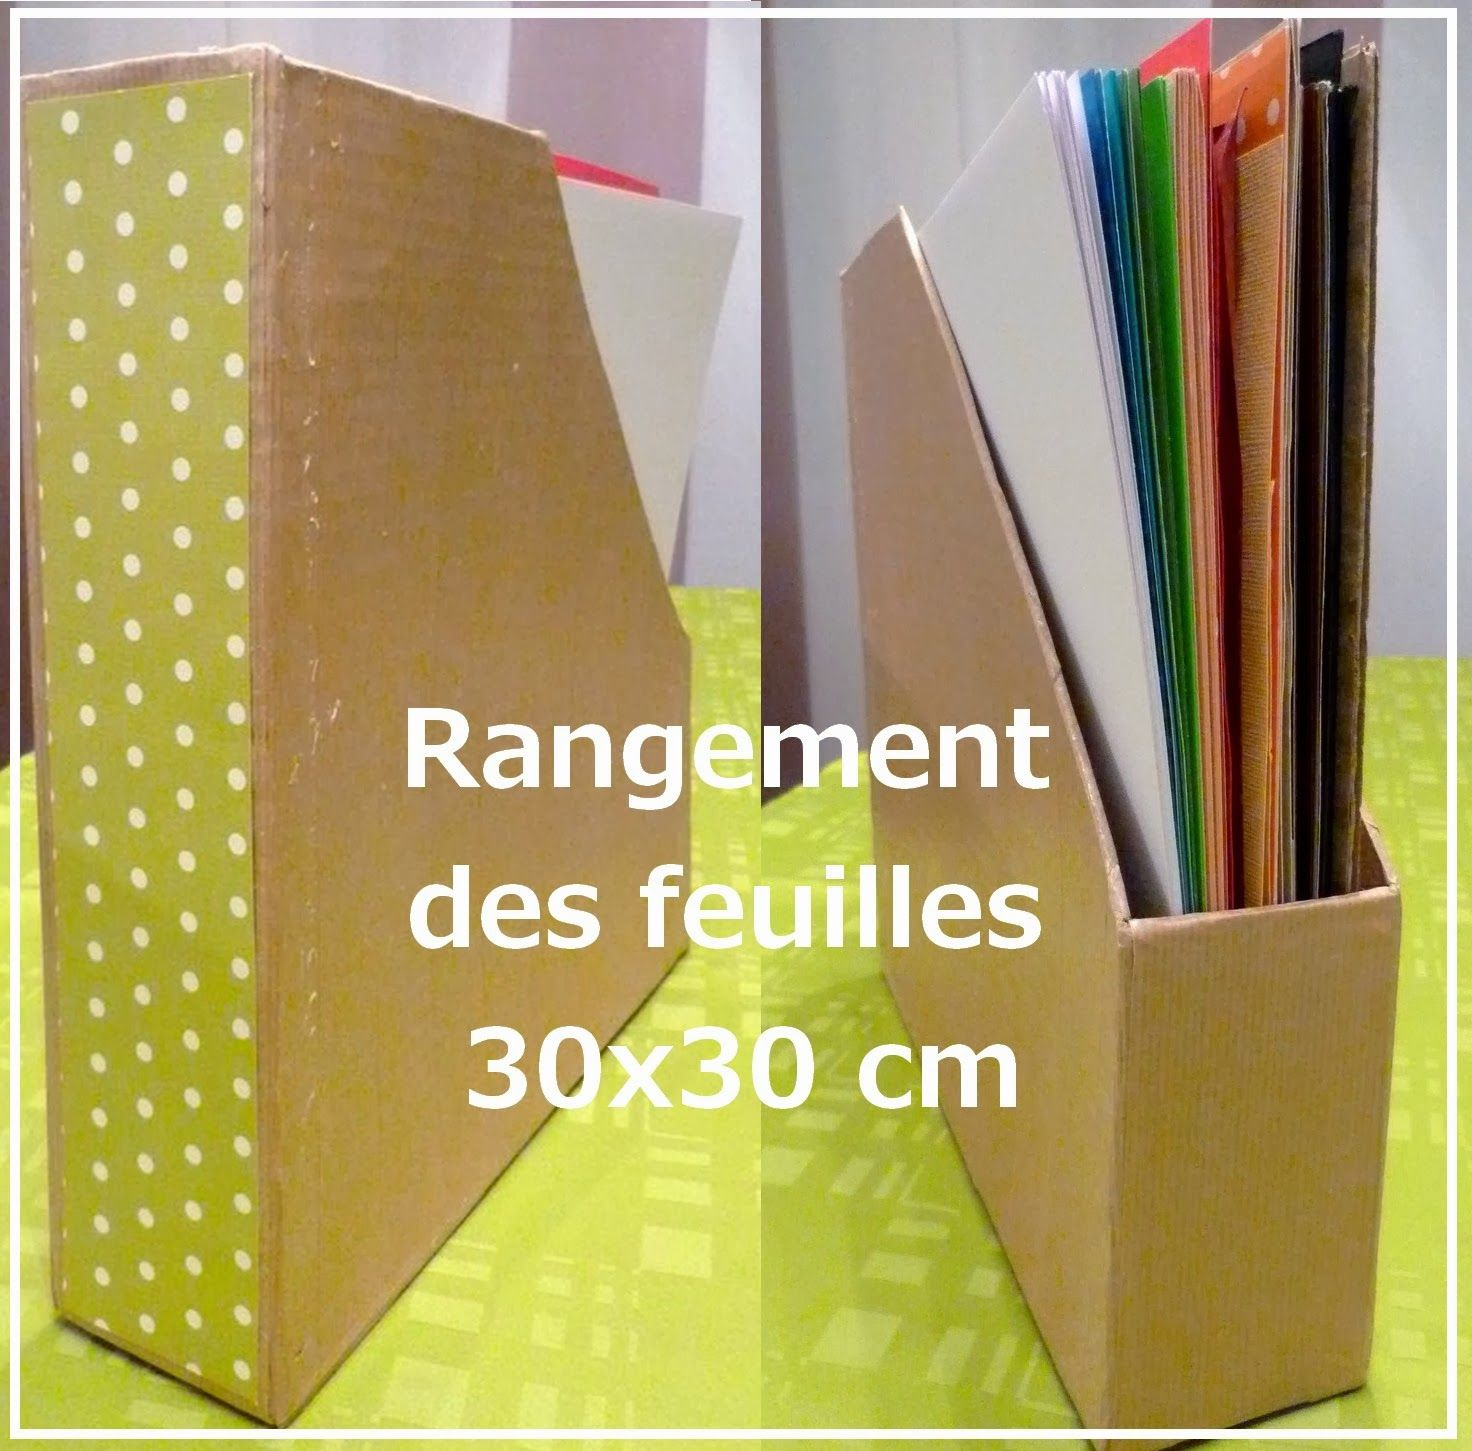 Tuto Rangement Des Feuilles 30 X 30cm Facon Range Revue Compatible Bibliotheque Exped Scrapbooking Rangement Rangement Feuille Bricolage Et Loisirs Creatifs